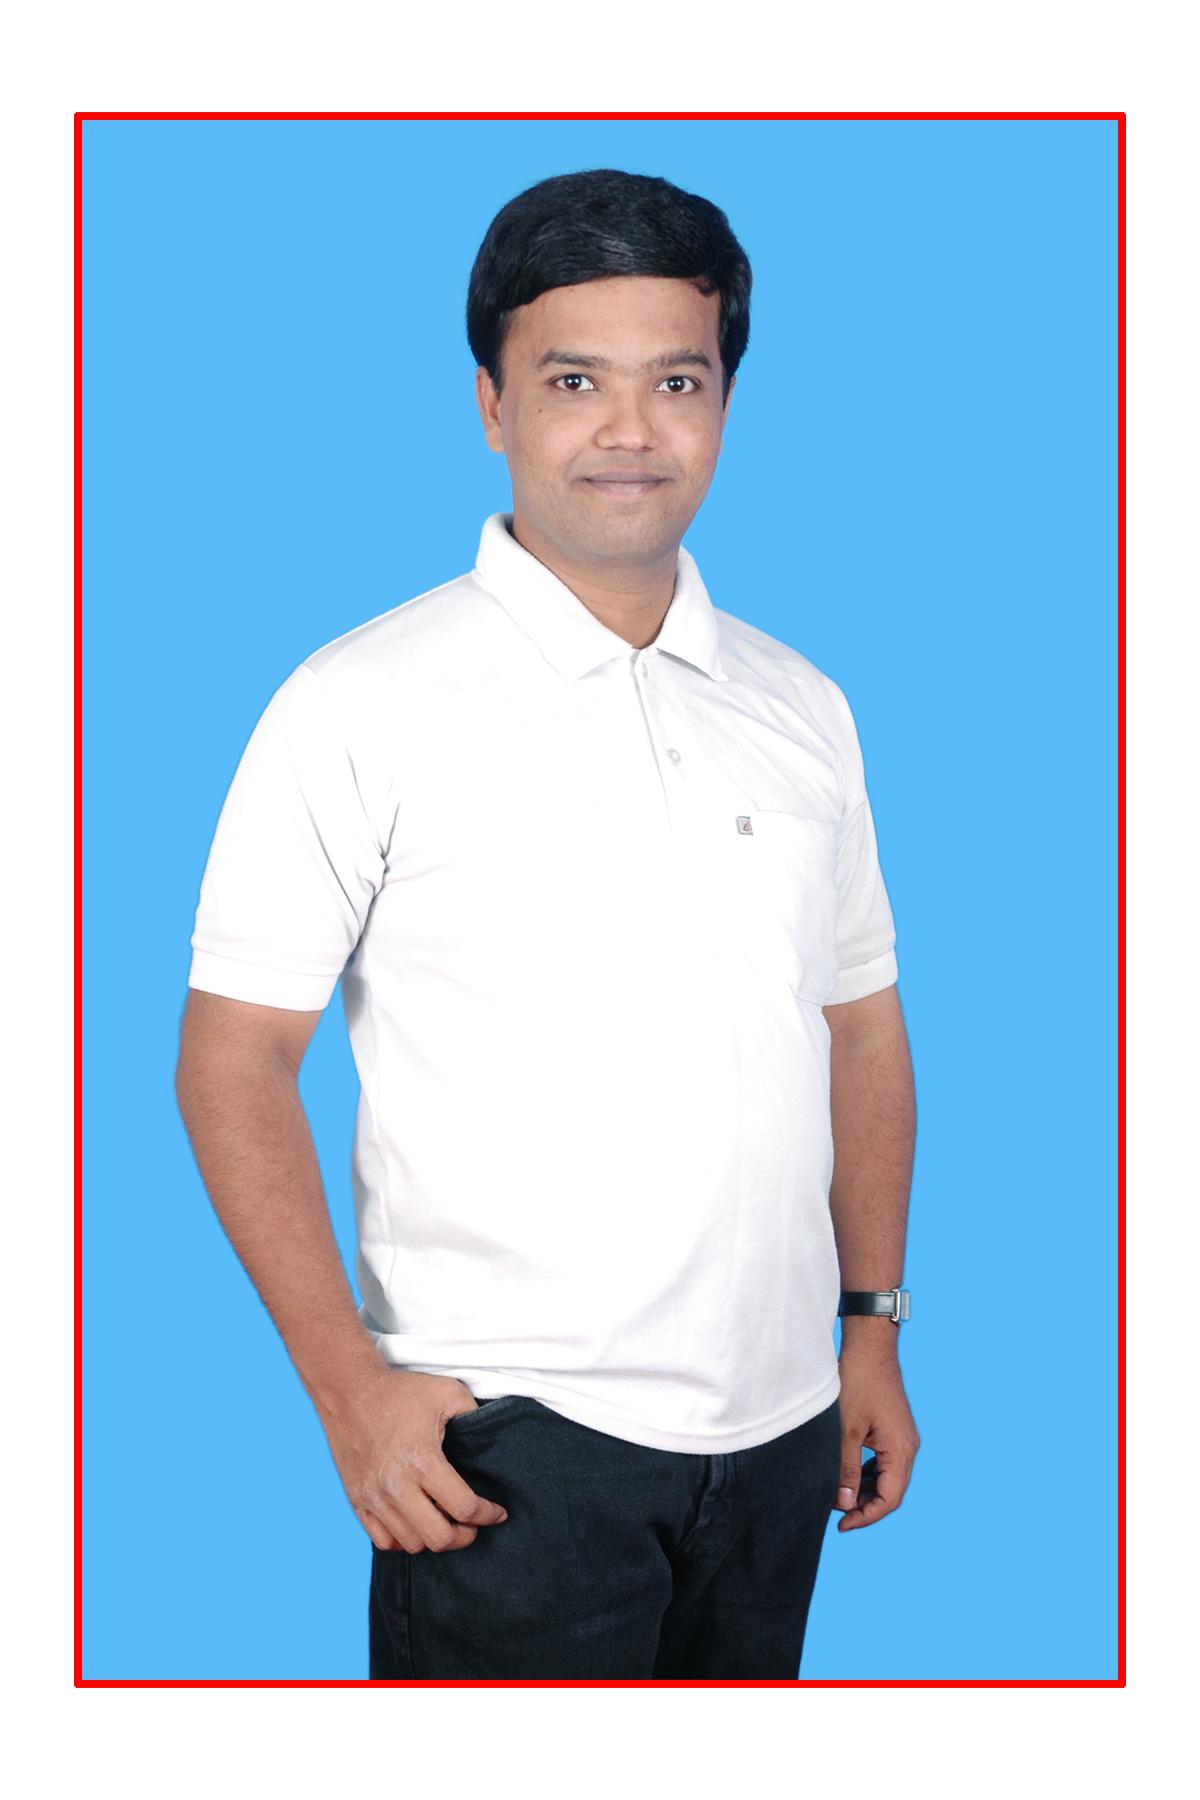 [New QIQ member]: Sudarshan Murthy